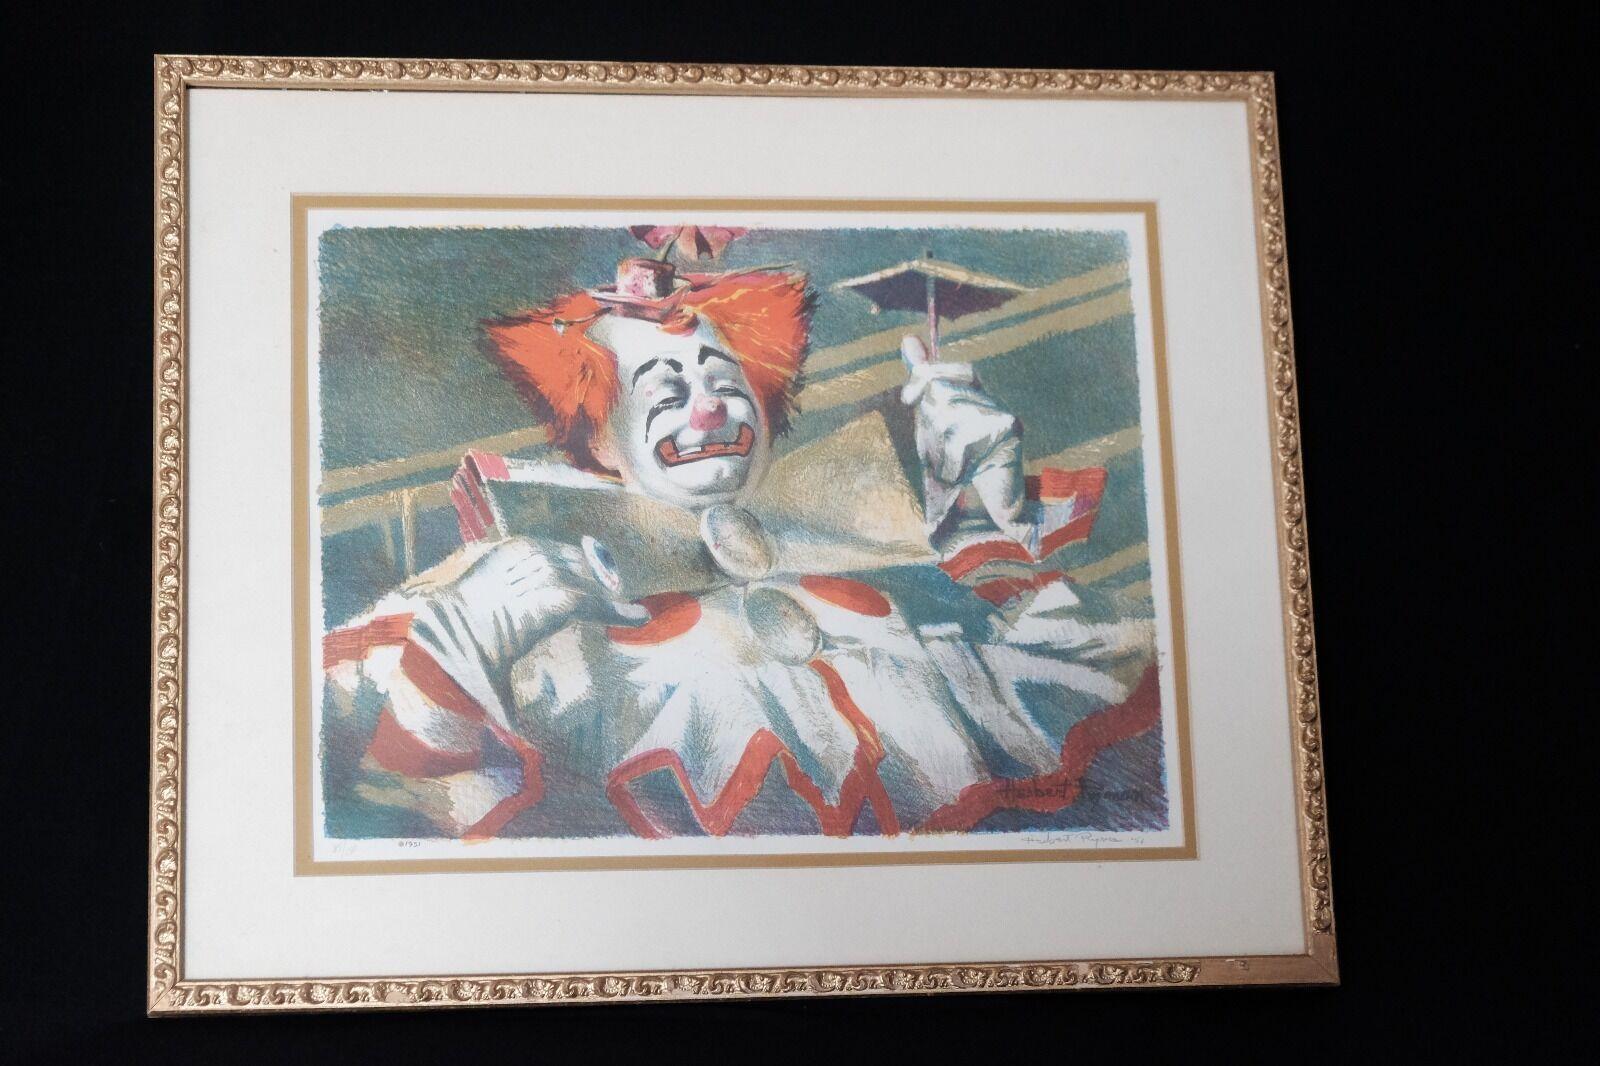 Disneyland Imagineer HERB RYMAN 1951 Signed Lithograph RARE Disney Legend - $924.84